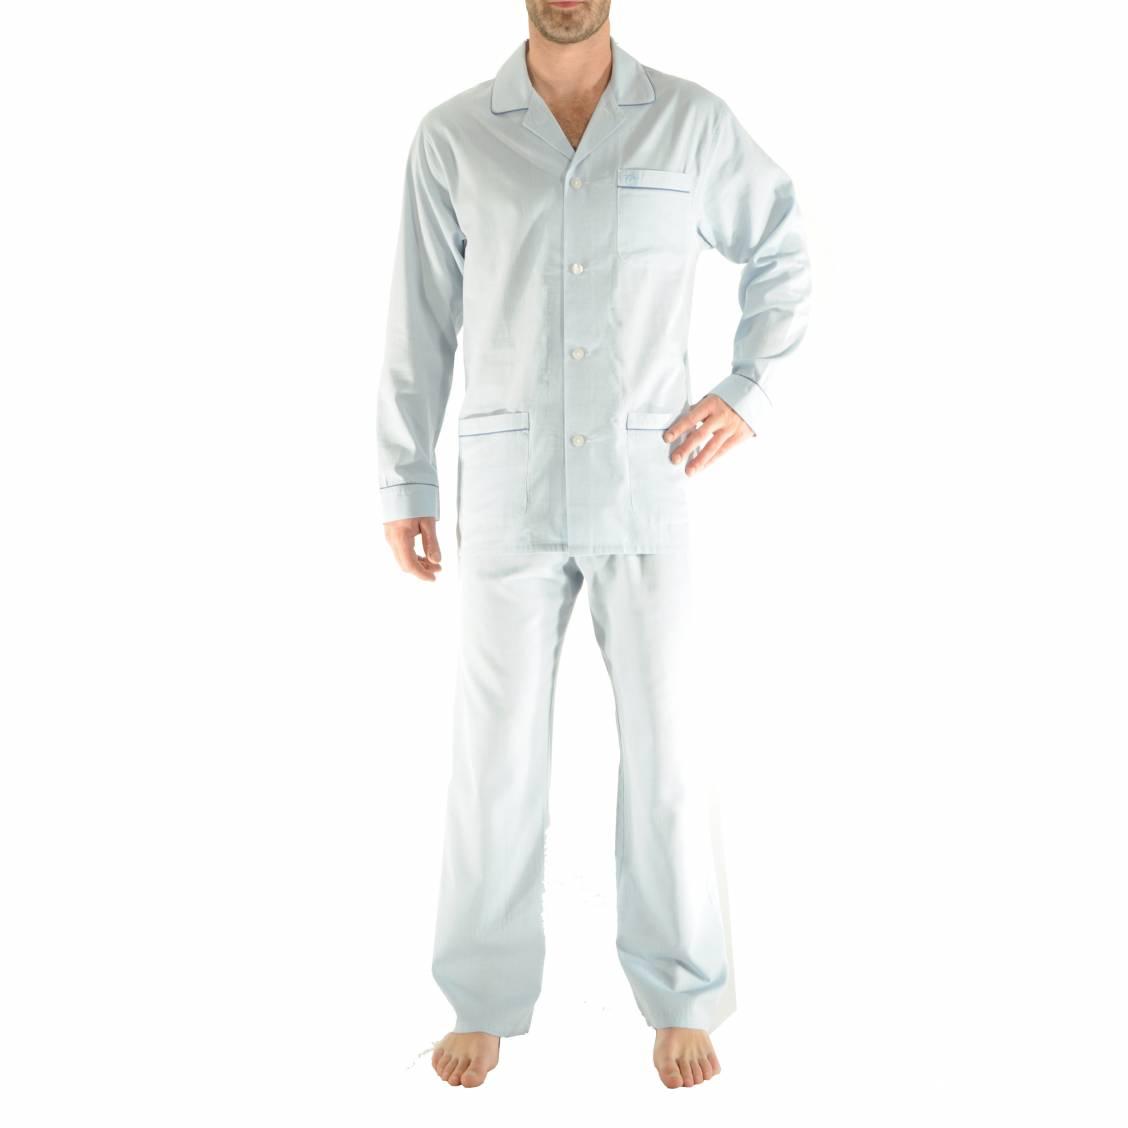 Pyjama Christian Cane en coton bleu clair à motifs